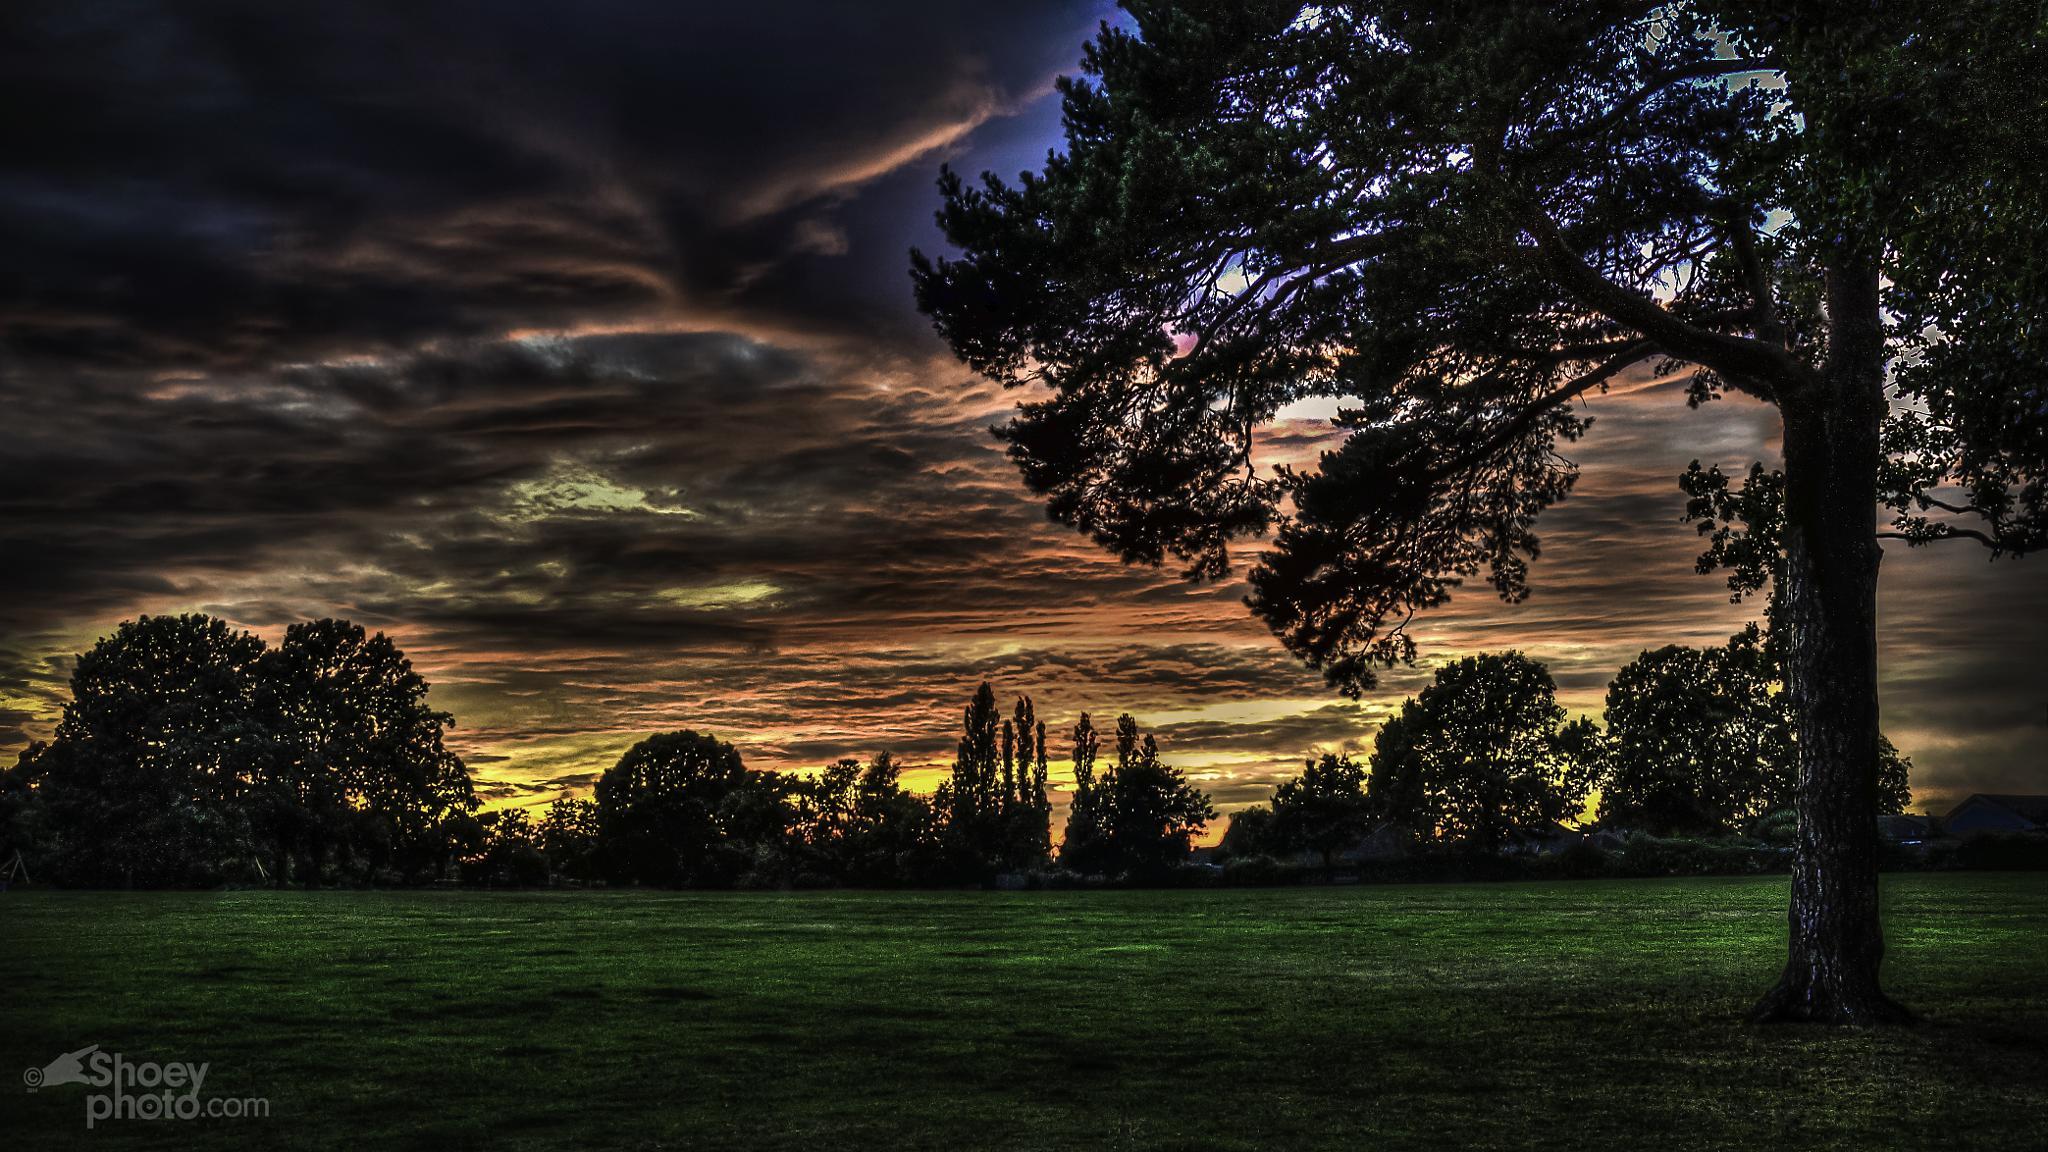 London Sunset by Shoeyphoto.com